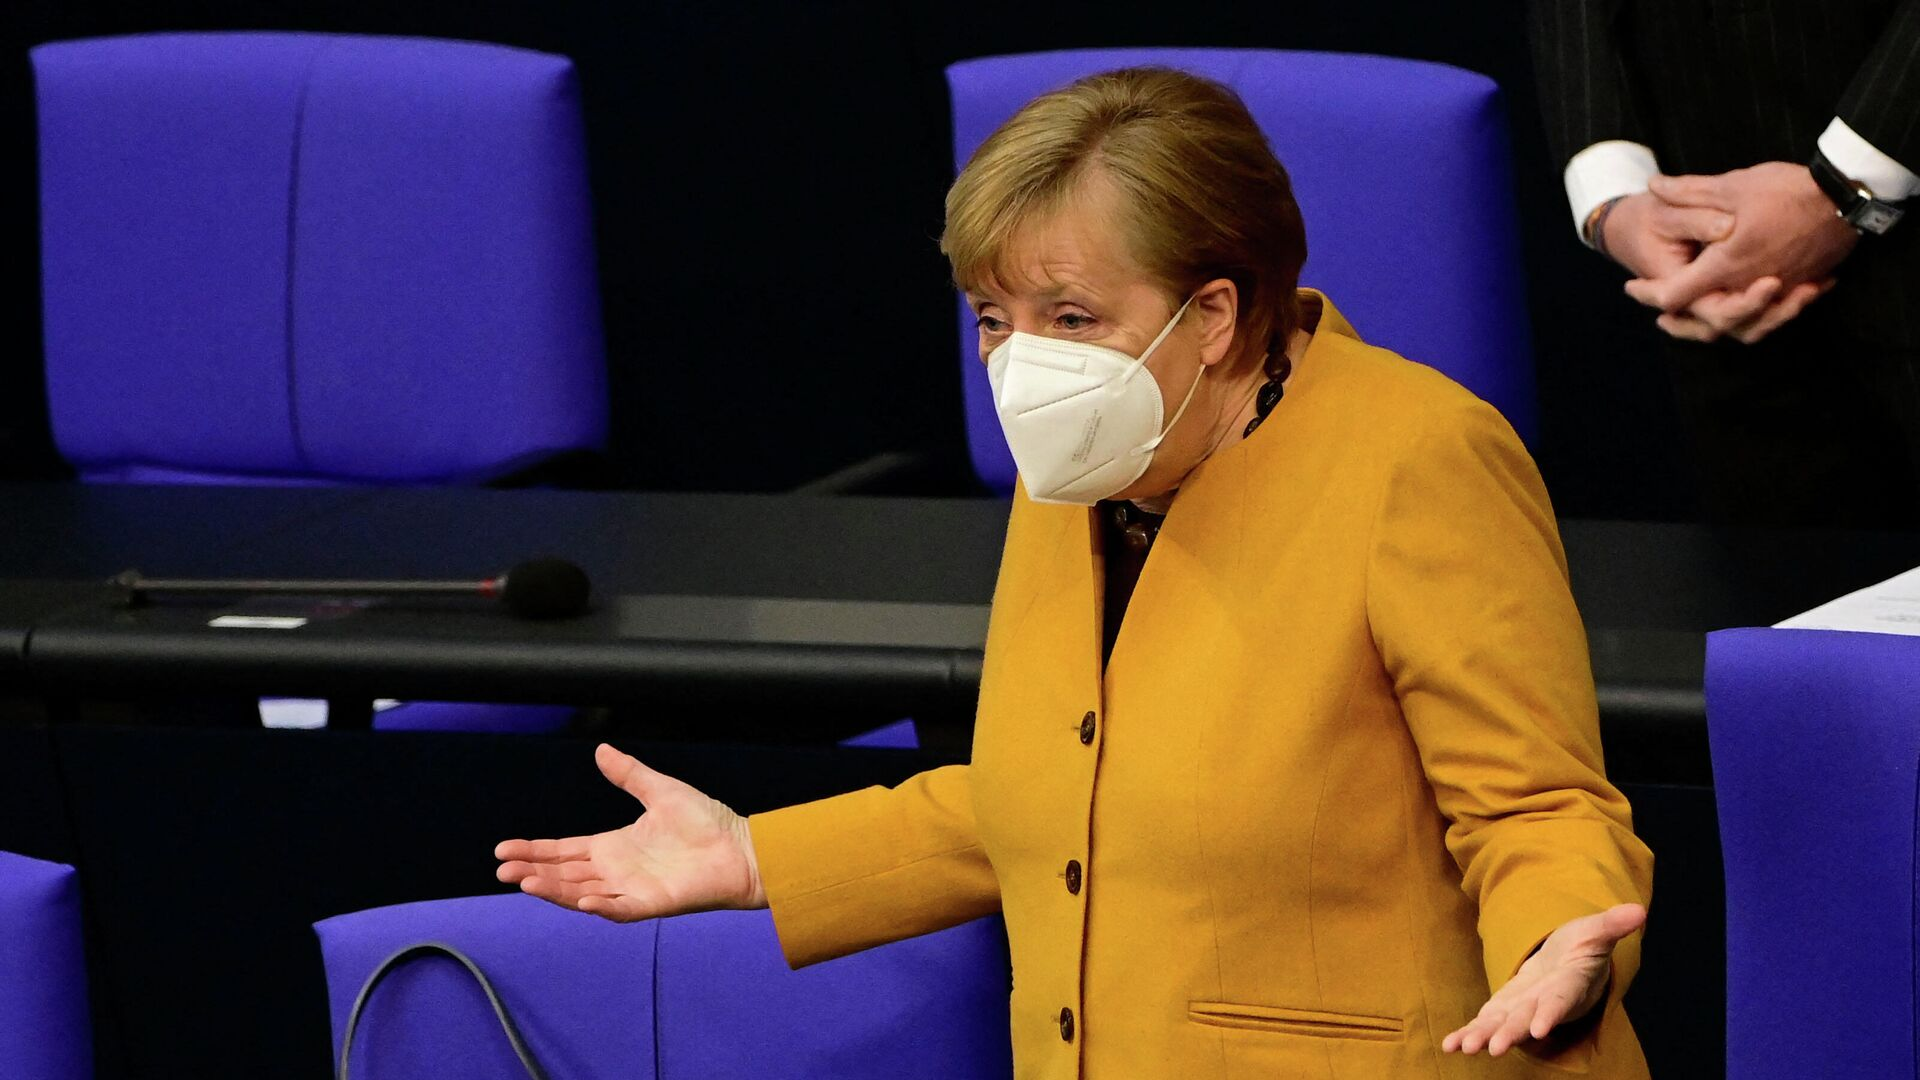 Канцлер Германии Ангела Меркель - Sputnik Таджикистан, 1920, 04.09.2021